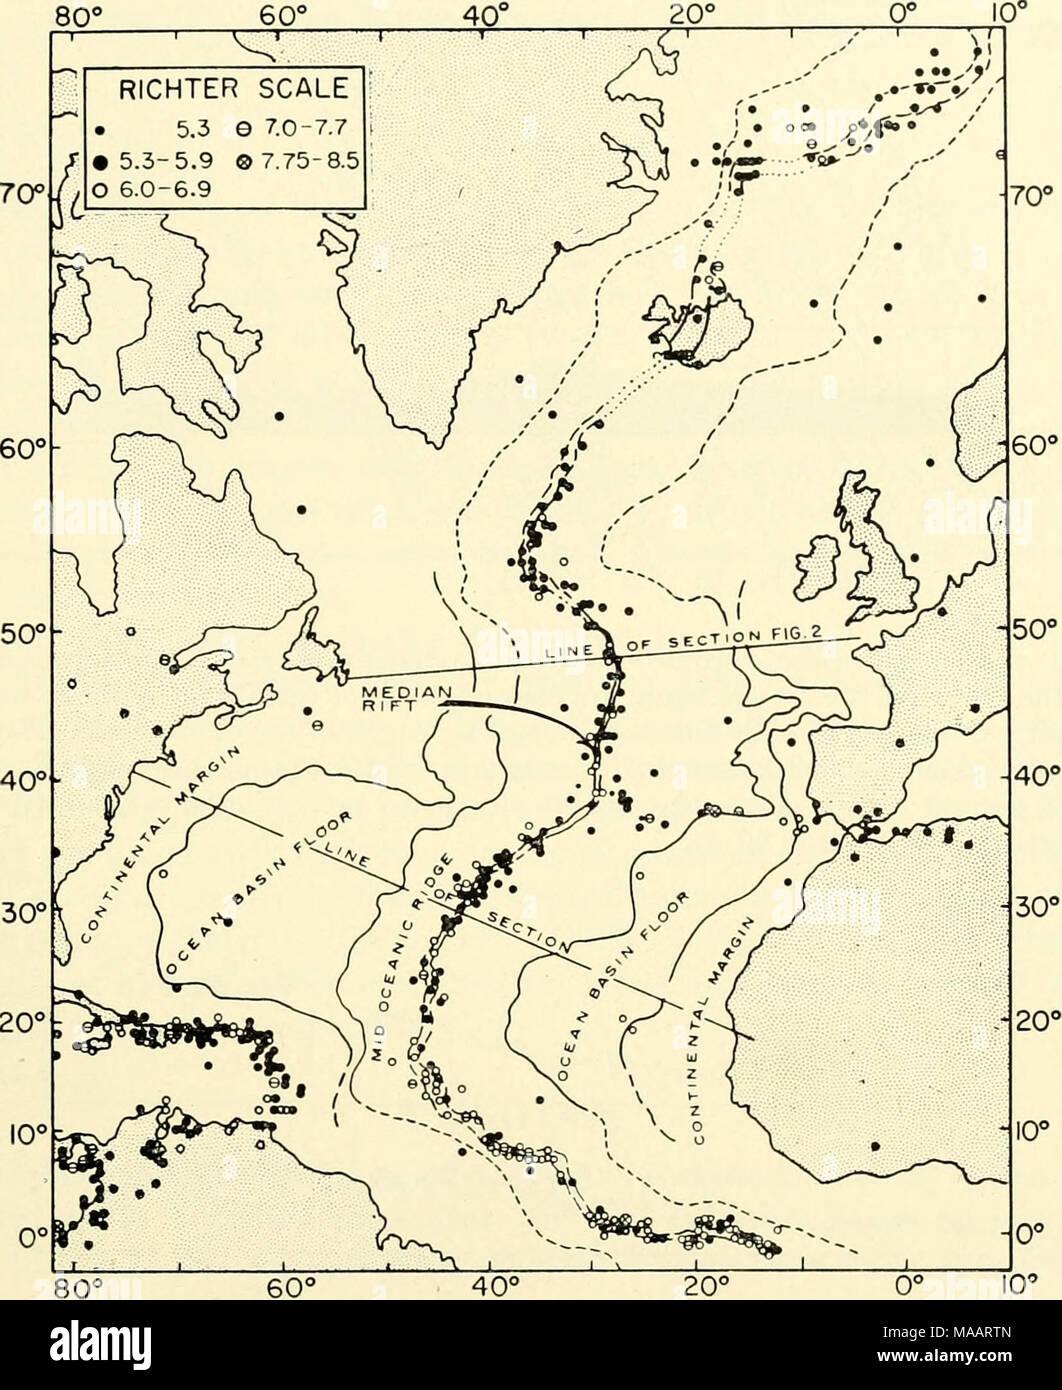 Coast and geodetic survey stock photos coast and geodetic survey the earth beneath the sea history continental margin ocean basin floor mid oceanic publicscrutiny Images